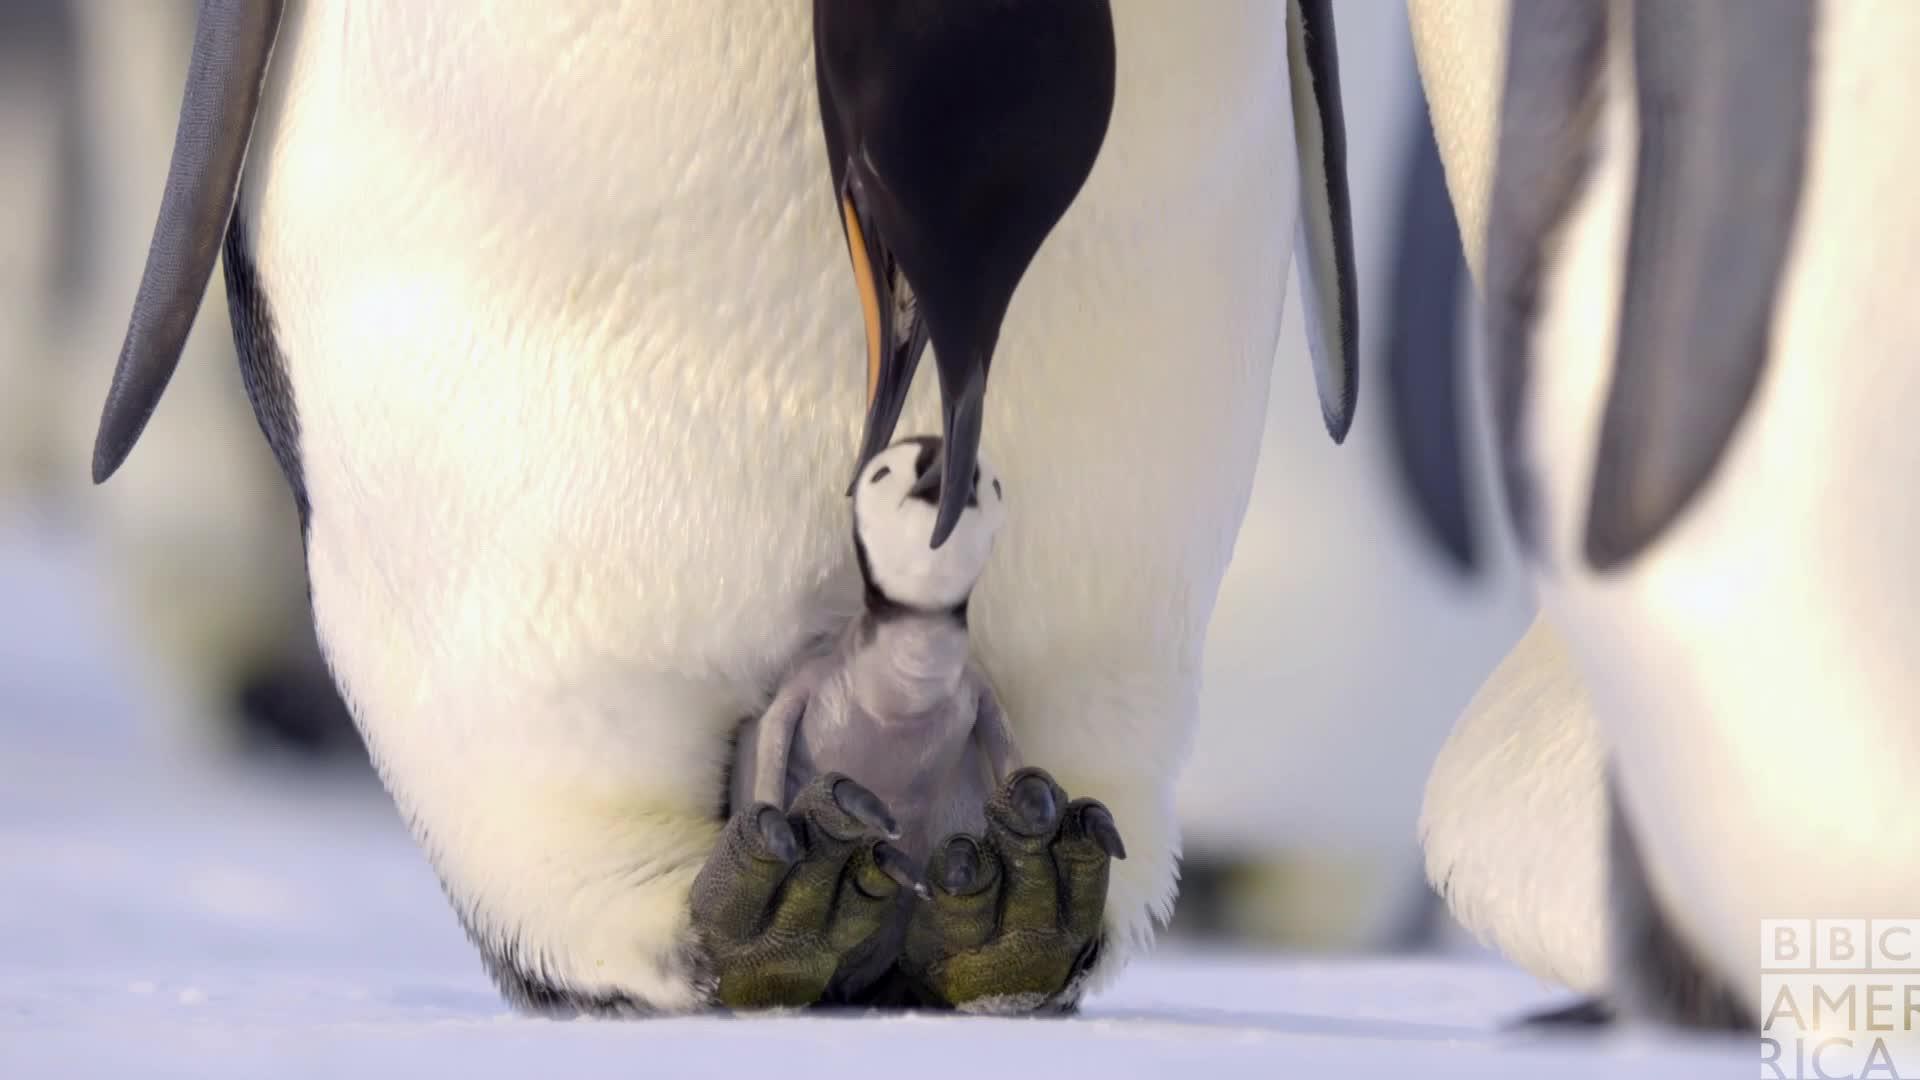 animal, animals, bbc america, bbc america dynasties, bbc america: dynasties, cute, dynasties, emperor penguin, emperor penguins, ewww, feed me, gag, hungry, penguin, penguins, Dynasties Hungry Penguin Chick GIFs